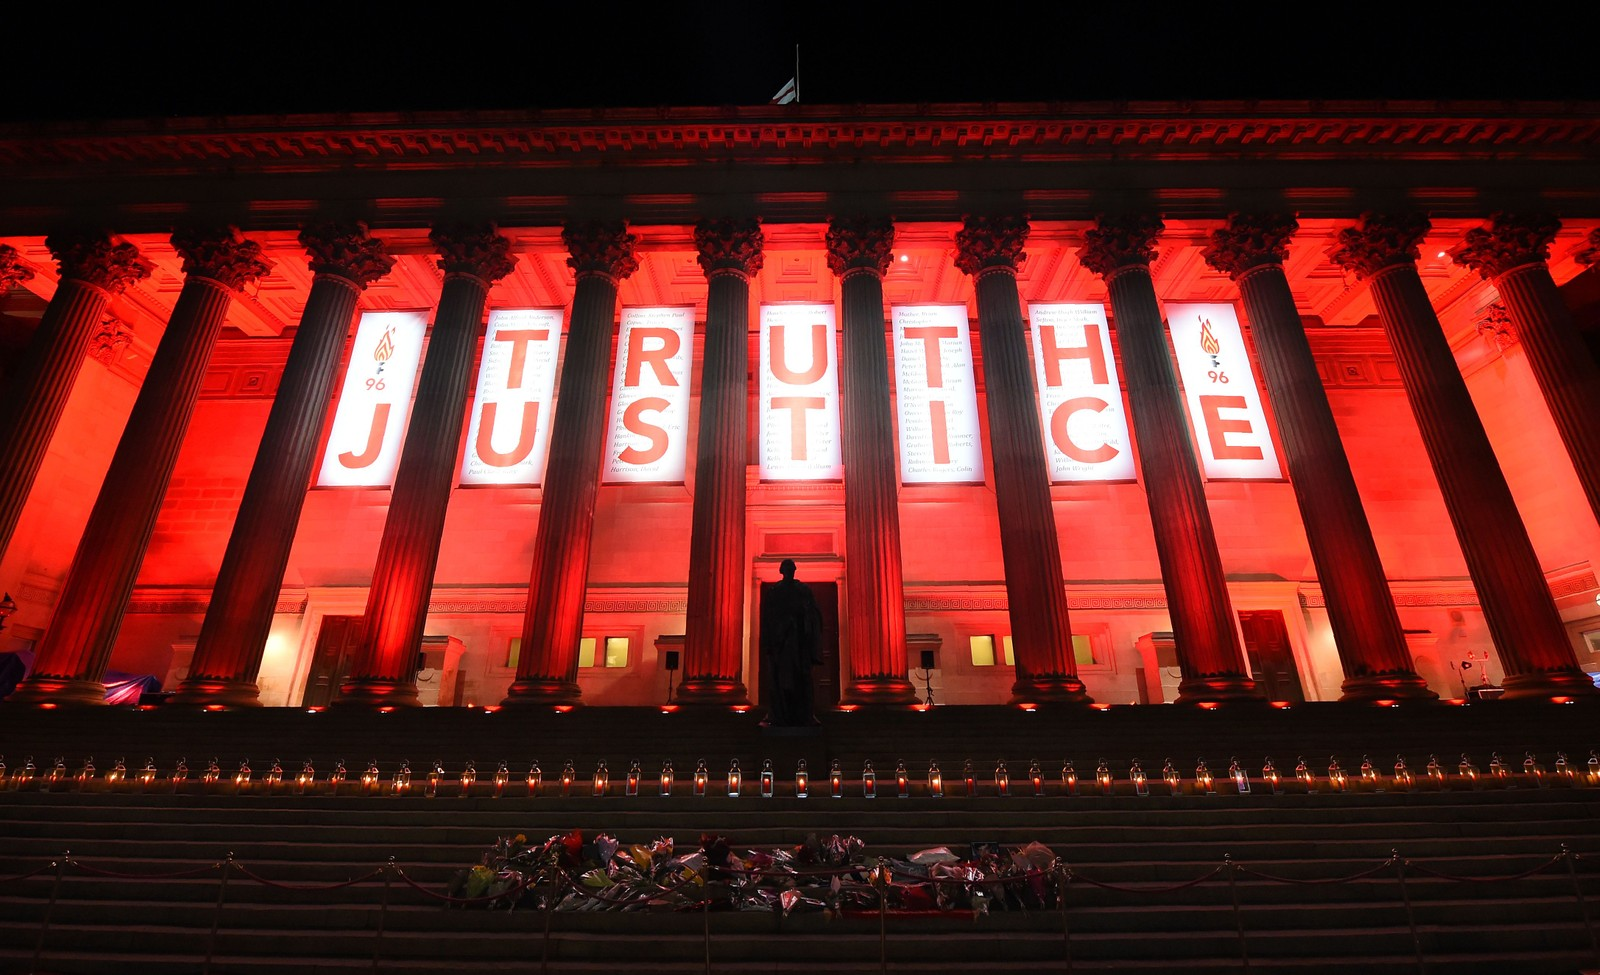 Blomster og tente lys på trappen til St. Georges Hall i Liverpool tidligere denne uken, til minne om de 96 fotballsupporterne som døde i Hillsborough-tragedien i 1989. Tirsdag denne uken ble det fastslått at tragedien skyldtes grov uaktsomhet fra politiets side.